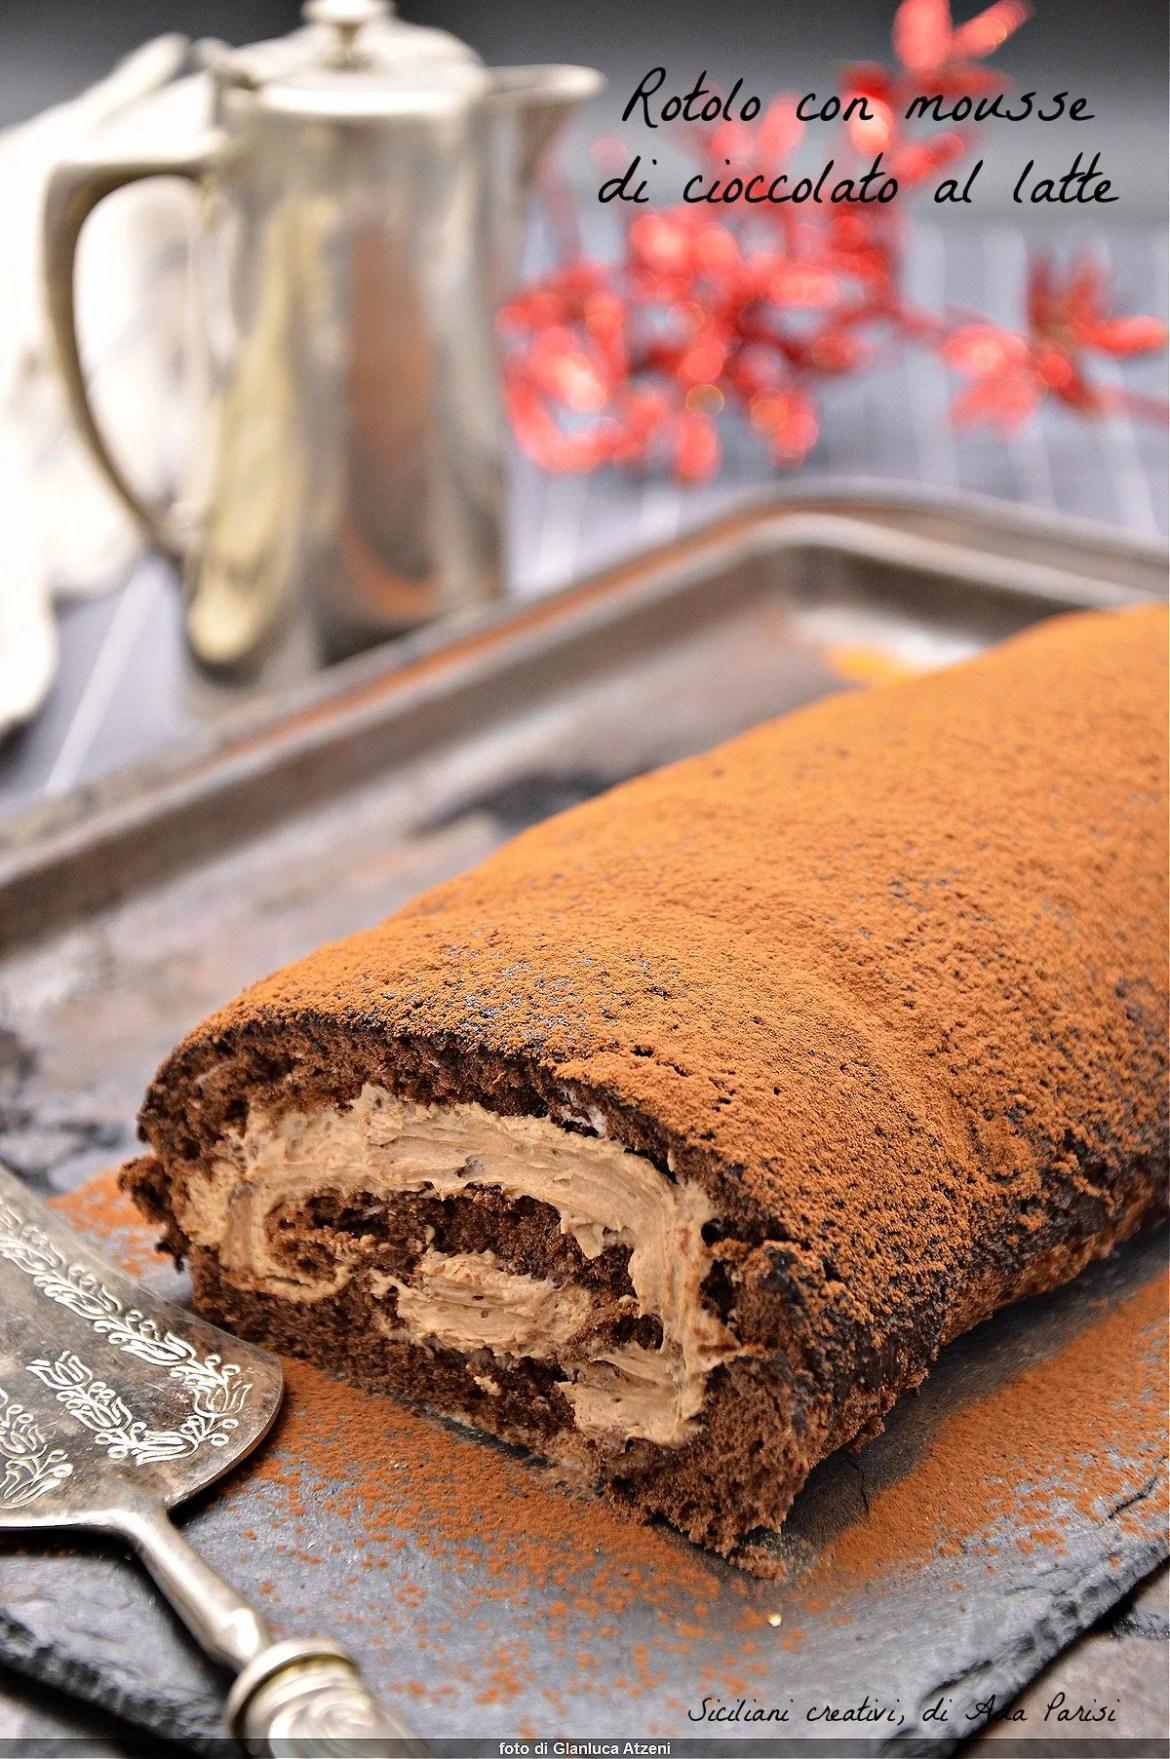 Rotolo al cacao con crema al cioccolato